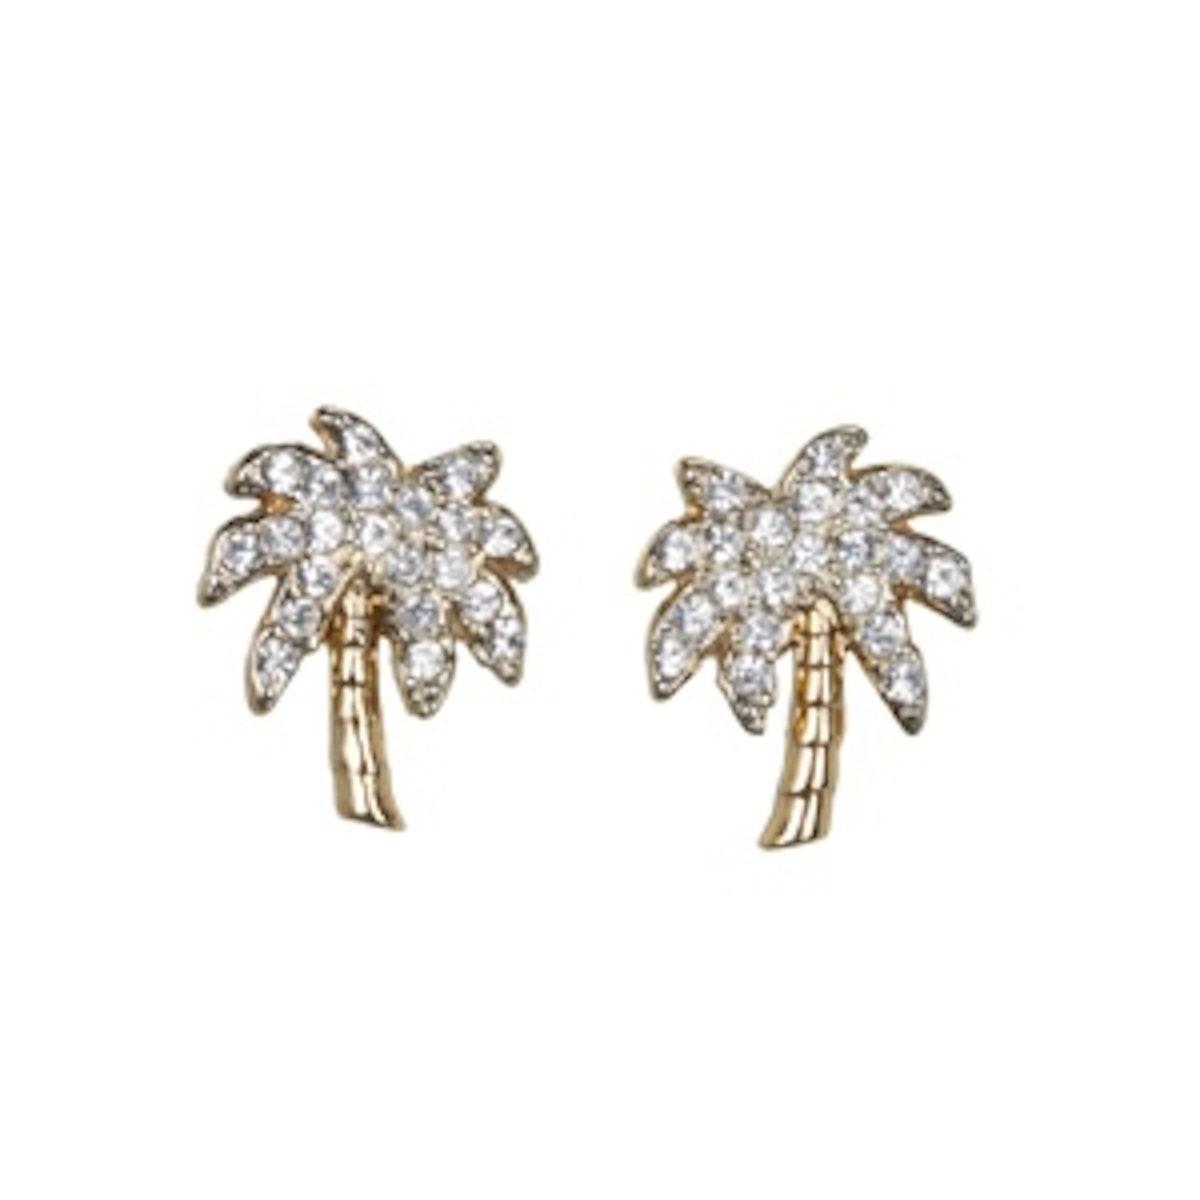 Palm Tree Stud Earrings